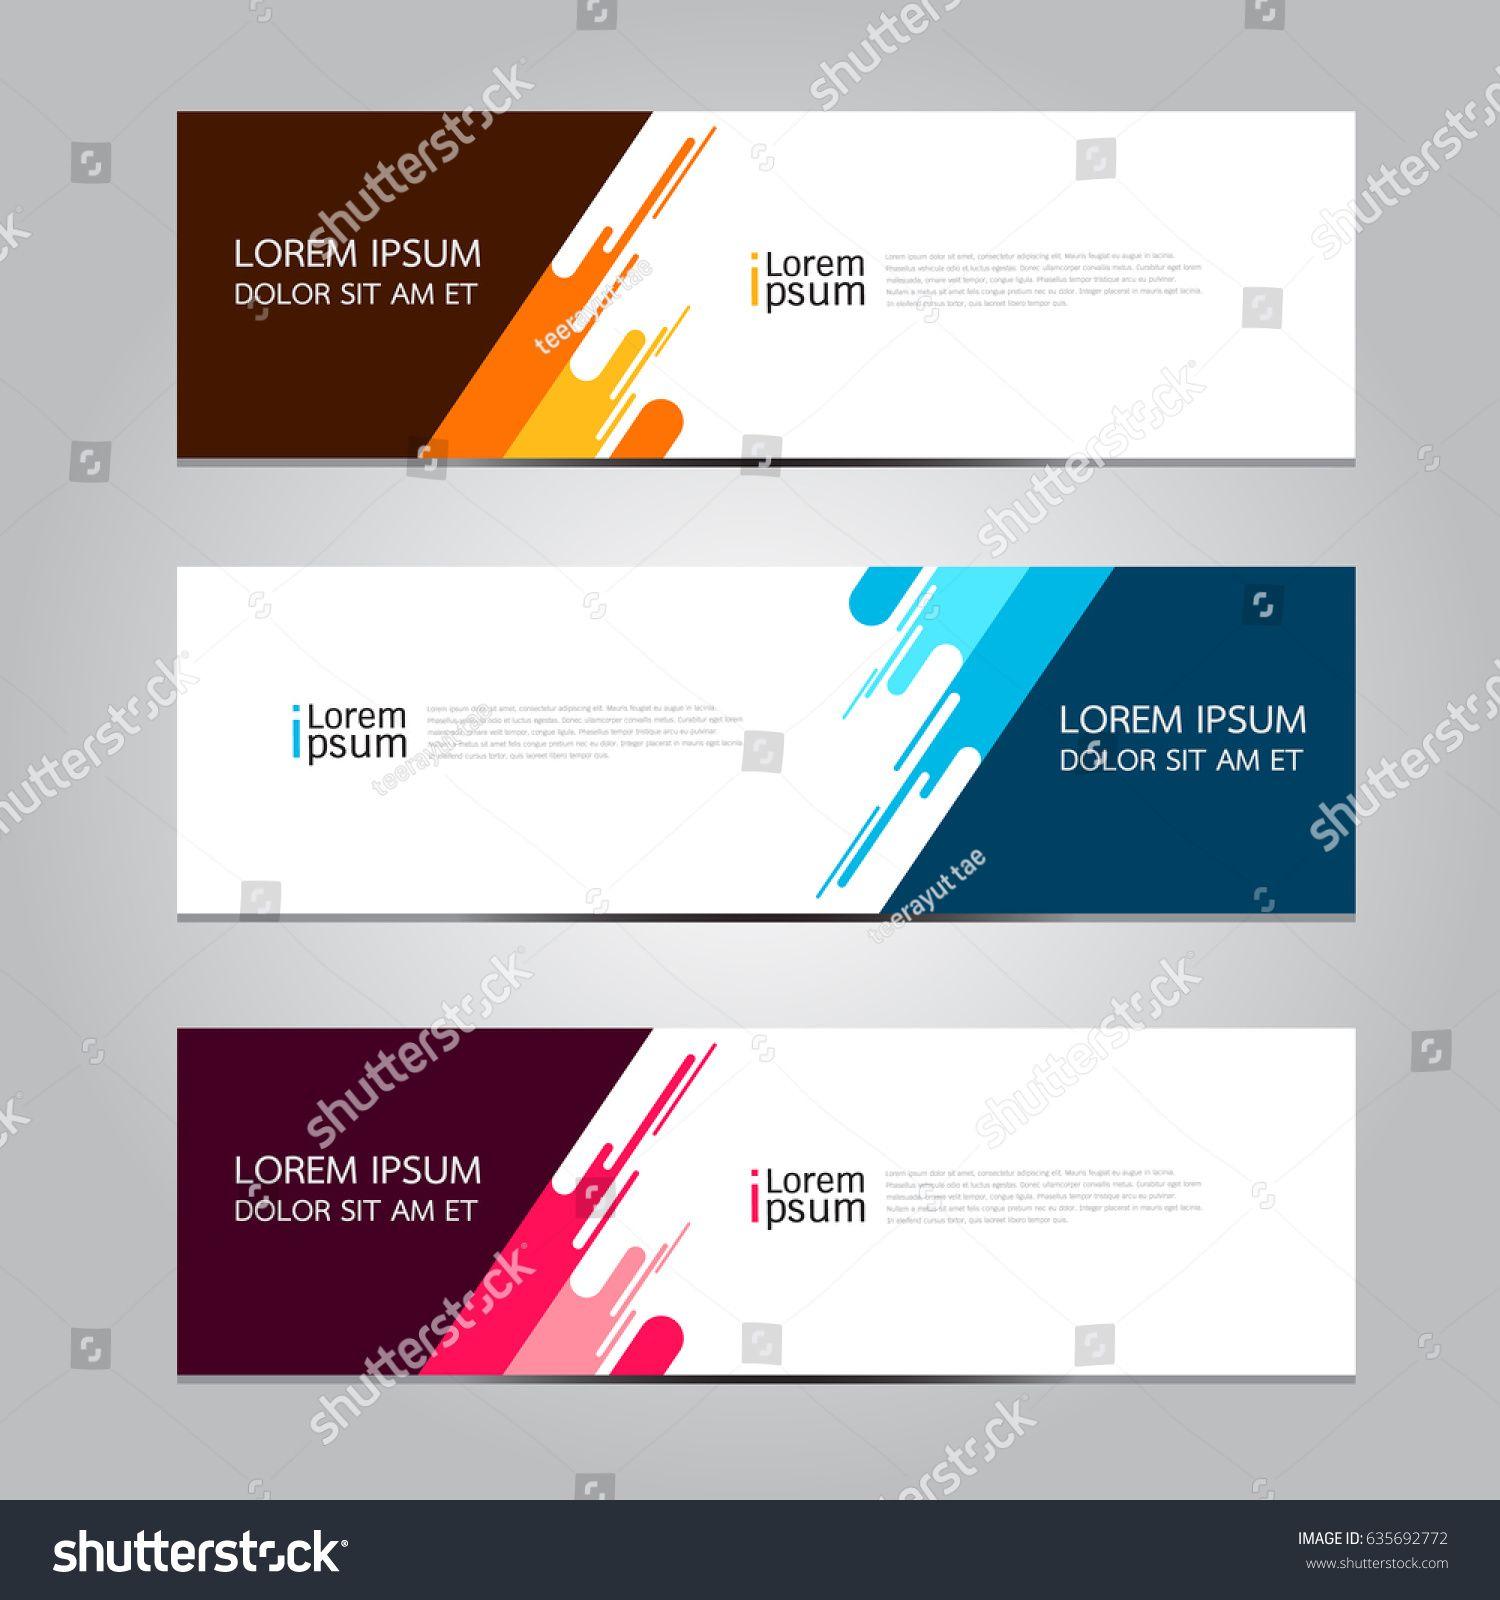 Vector Abstract Geometric Design Banner Web Template Sponsored Affiliate Geometric Abst Banner Design Inspiration Banner Design Layout Web Banner Design